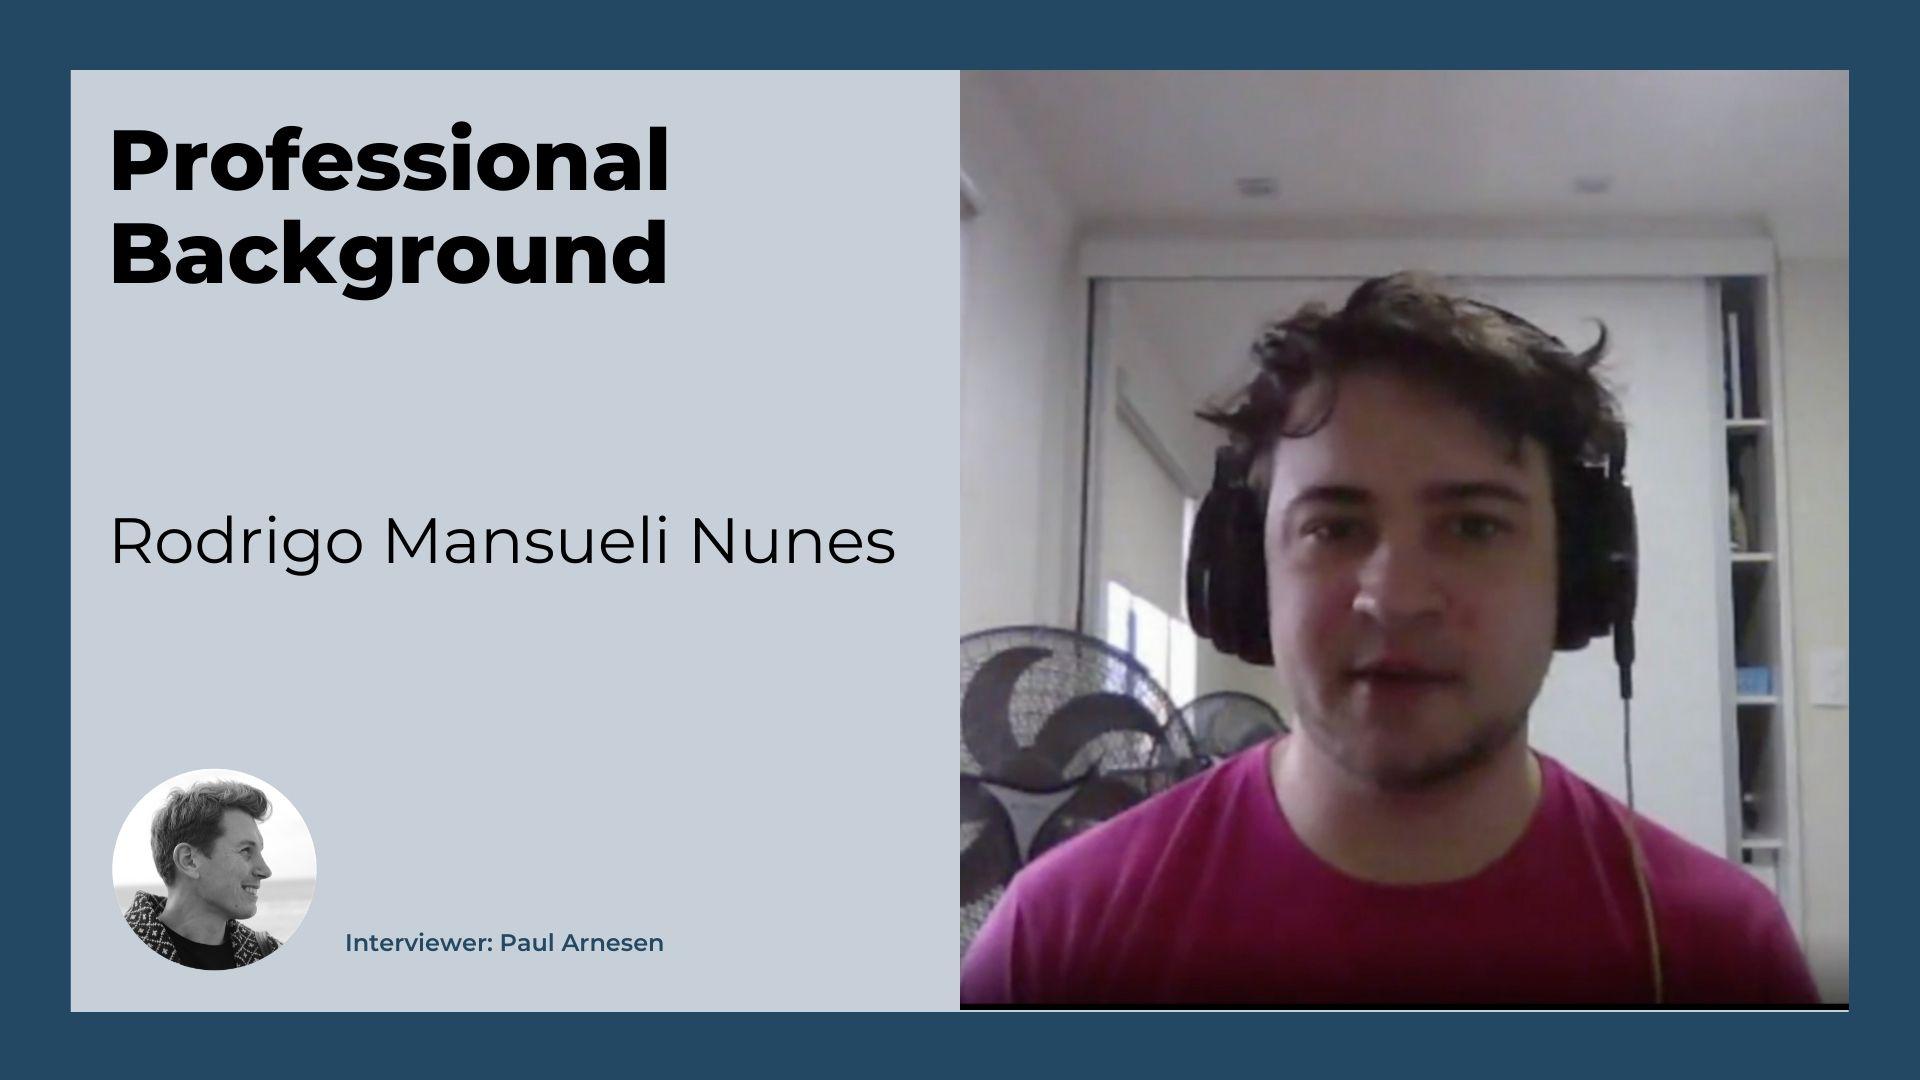 Rodrigo Mansueli Nunes